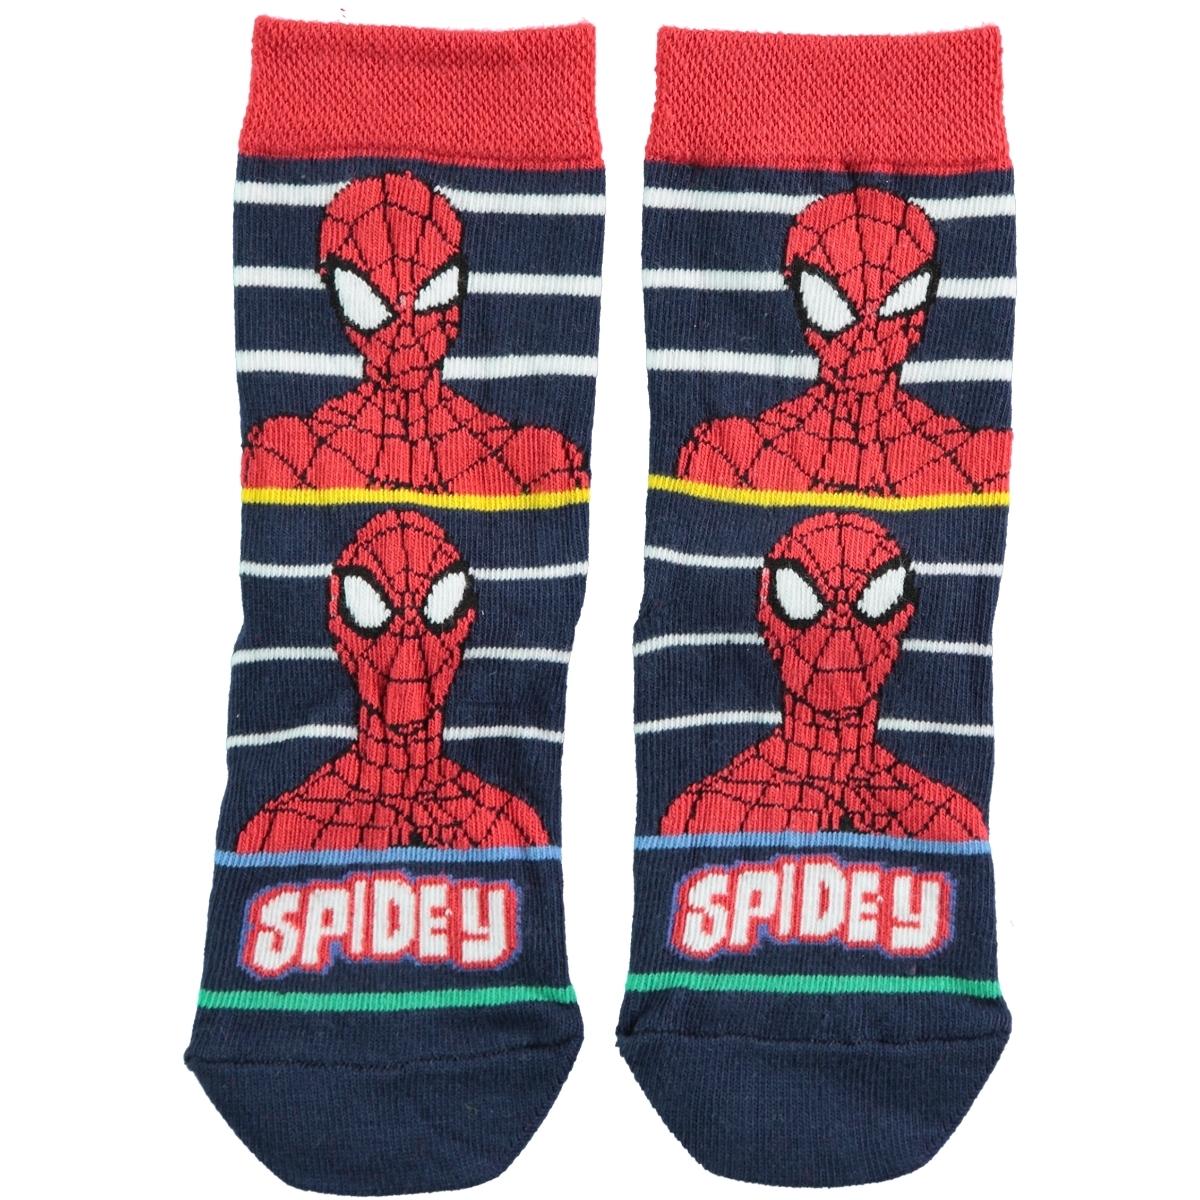 Spiderman Navy Blue Ankle Socks Boy Age 5-9